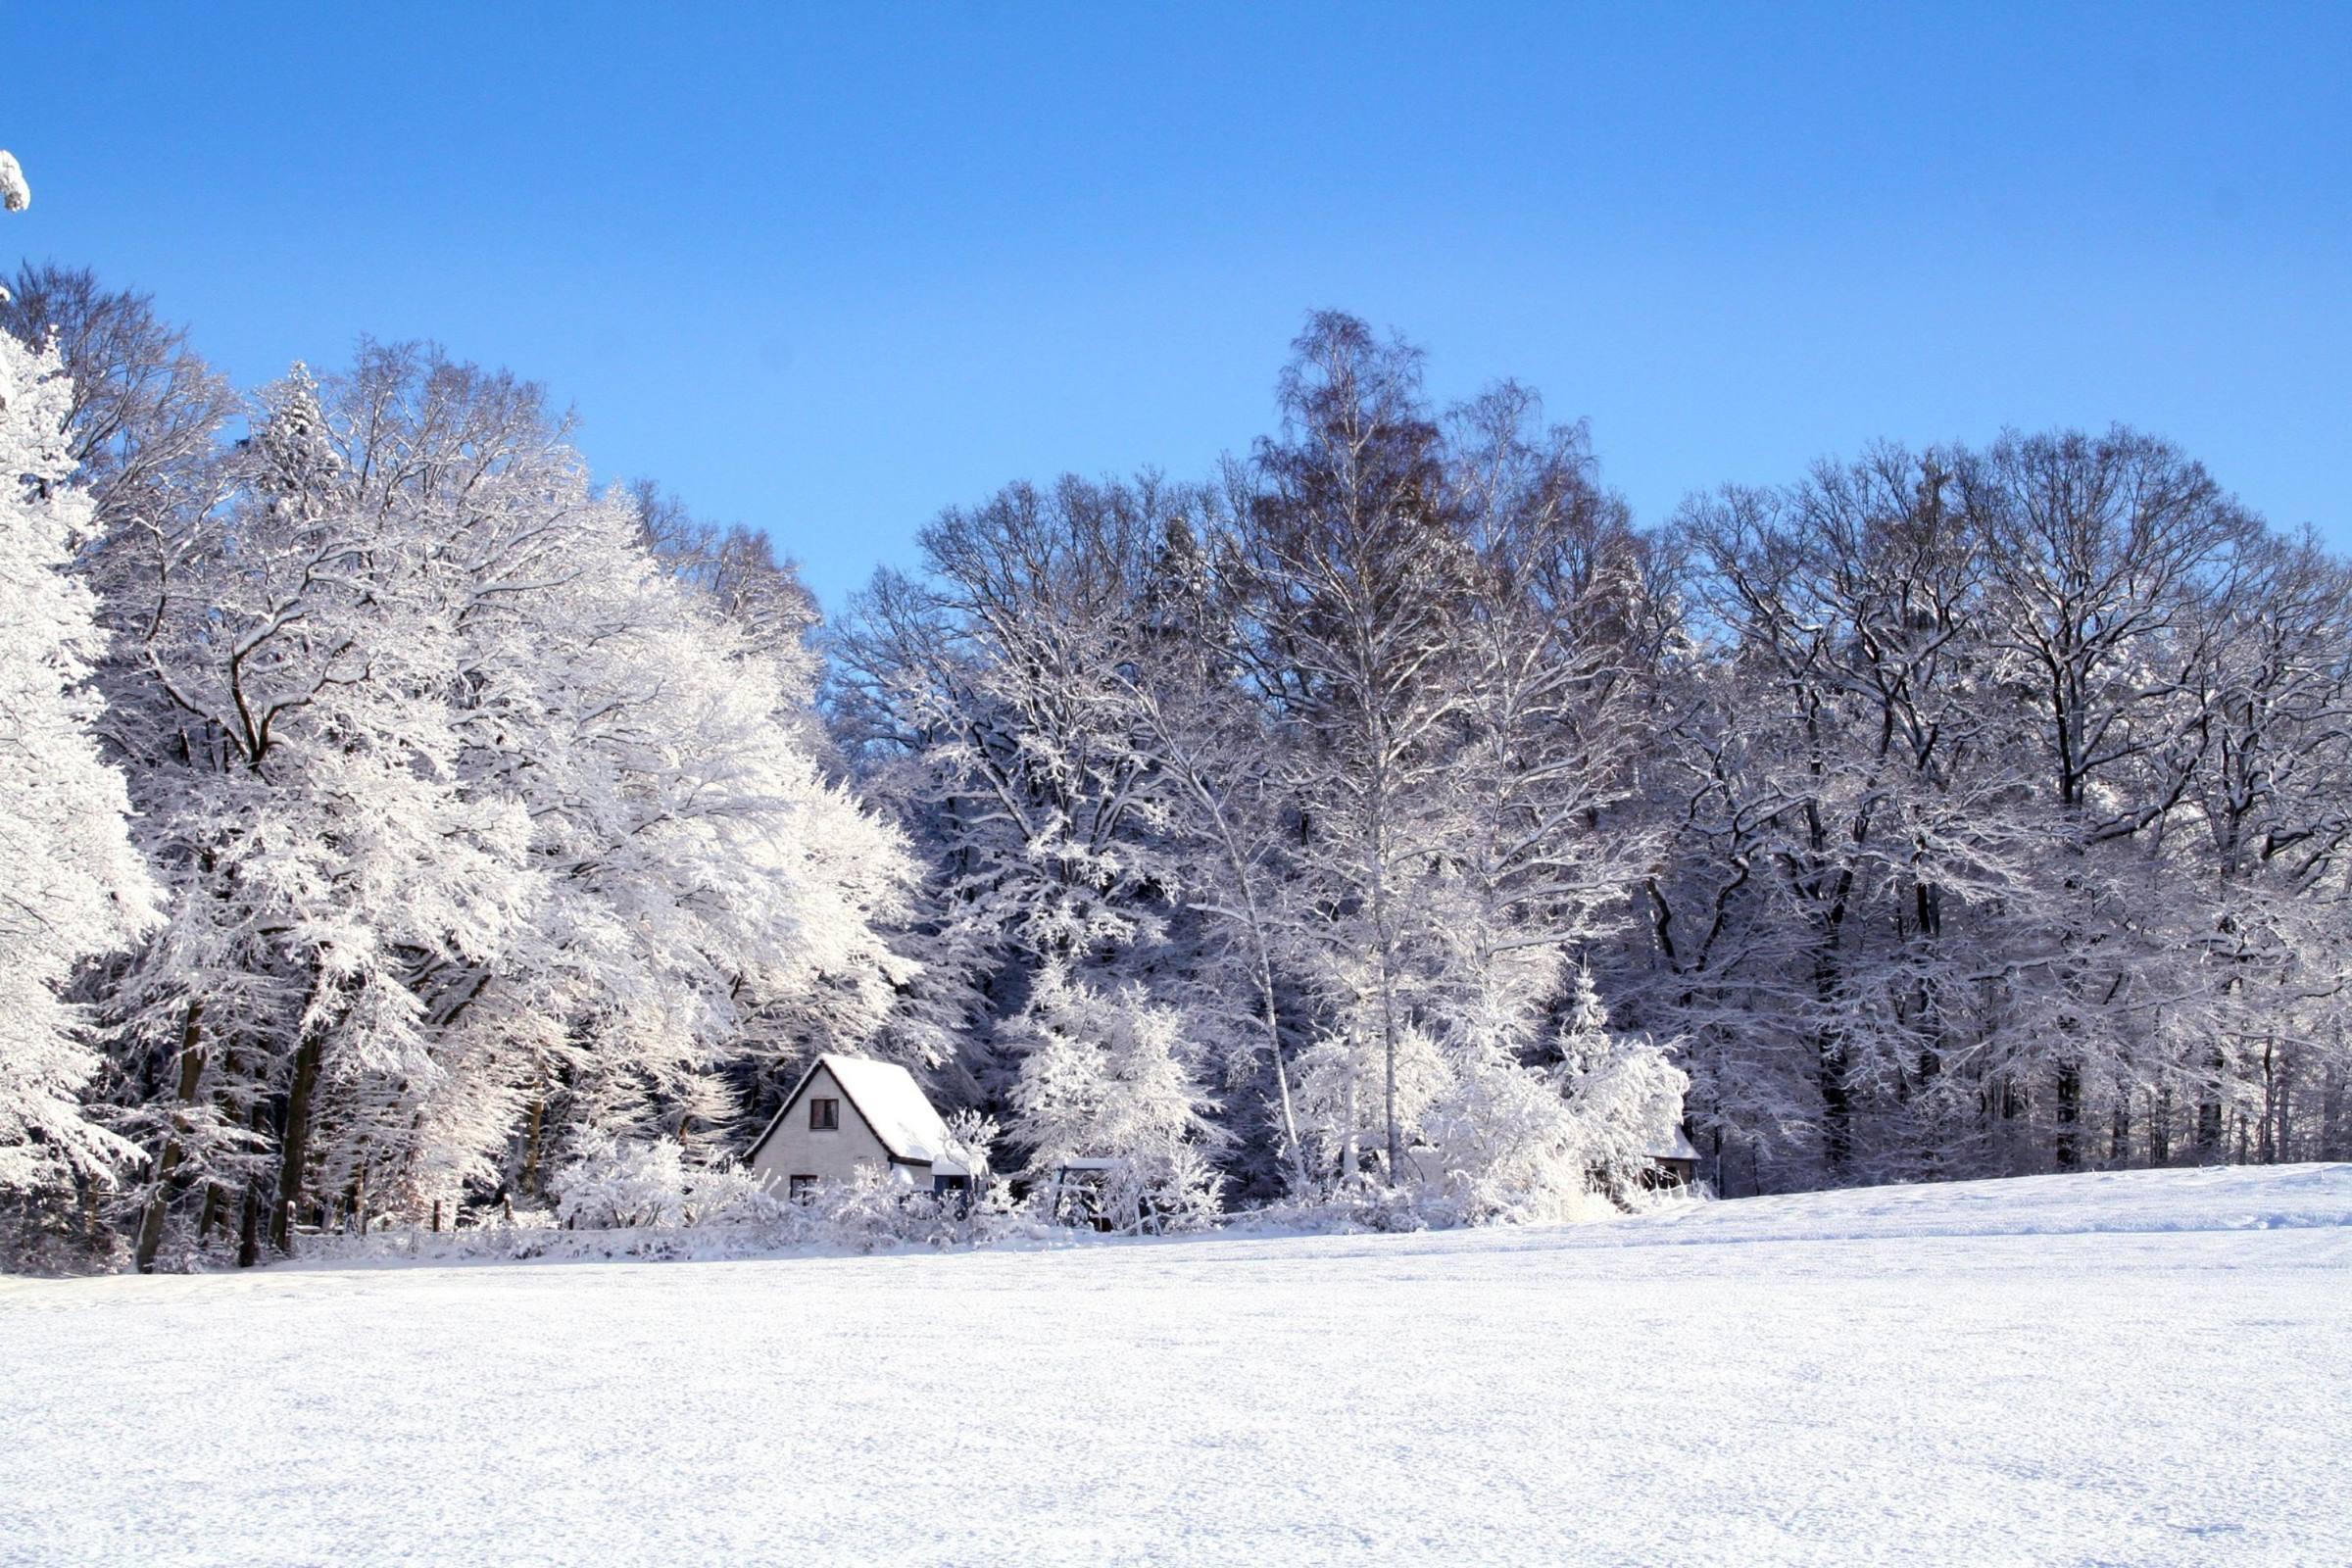 winter house snow trees ice blue sky